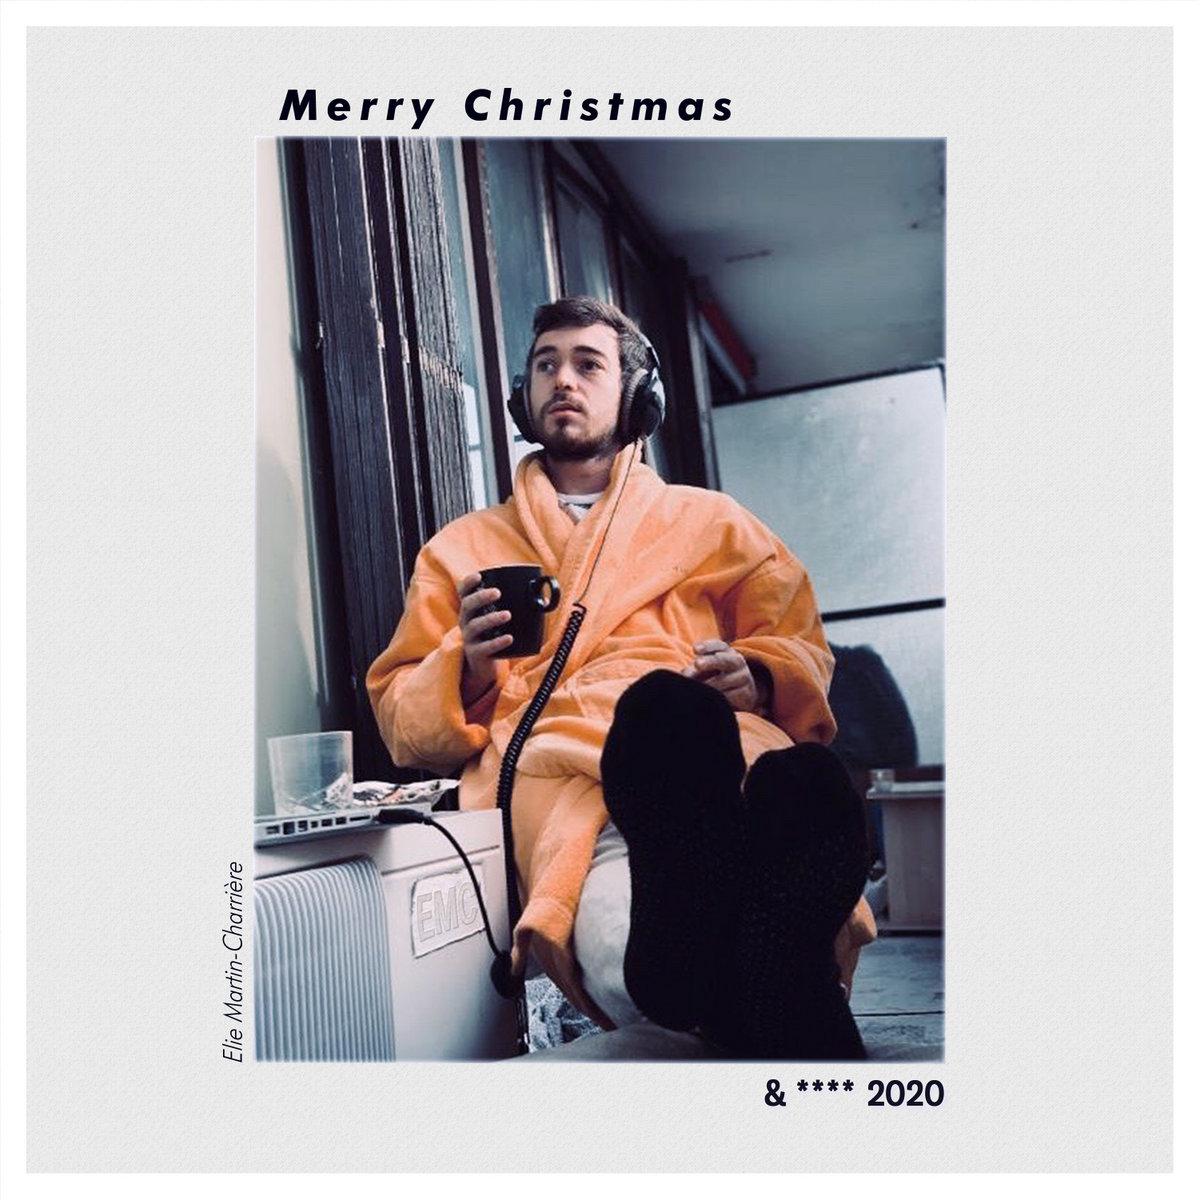 Merry Christmas & **** 2020 de Élie Martin-Charrière